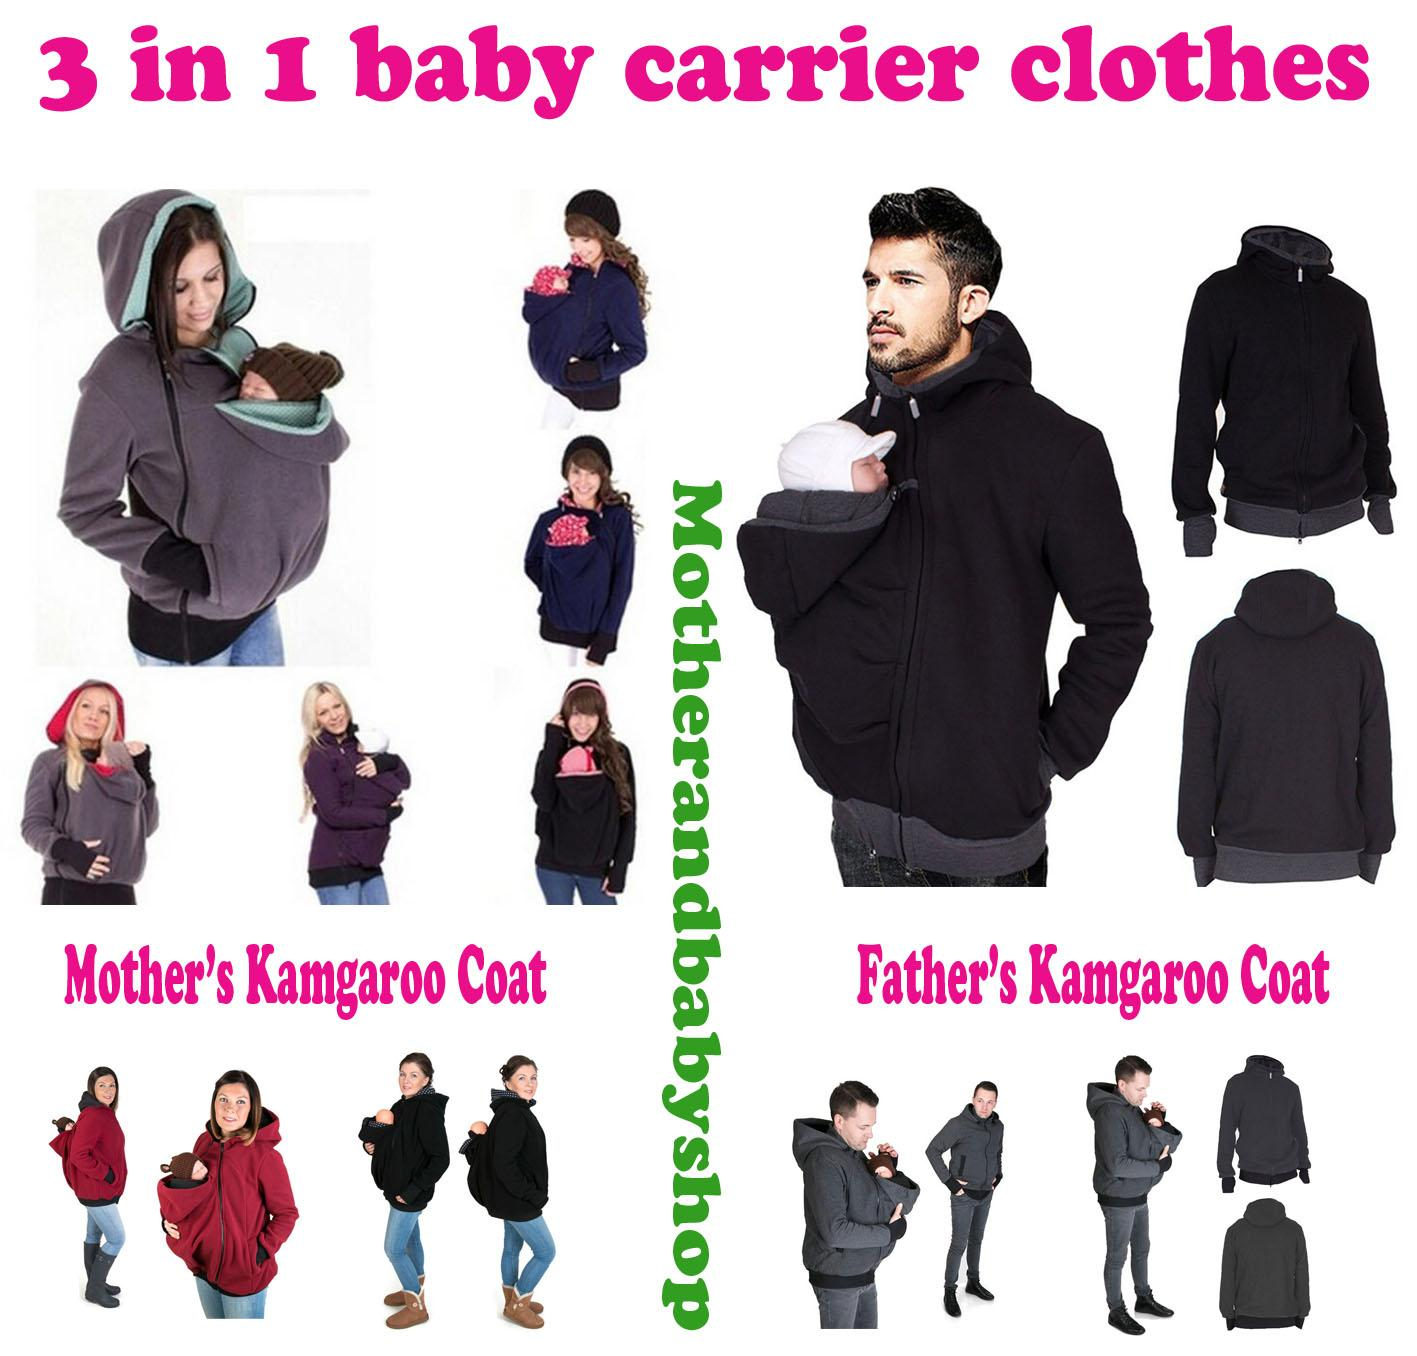 Vestiti Maternità 1 Acquista Baby Carrier In 3 Multifunzionale nqFYSA